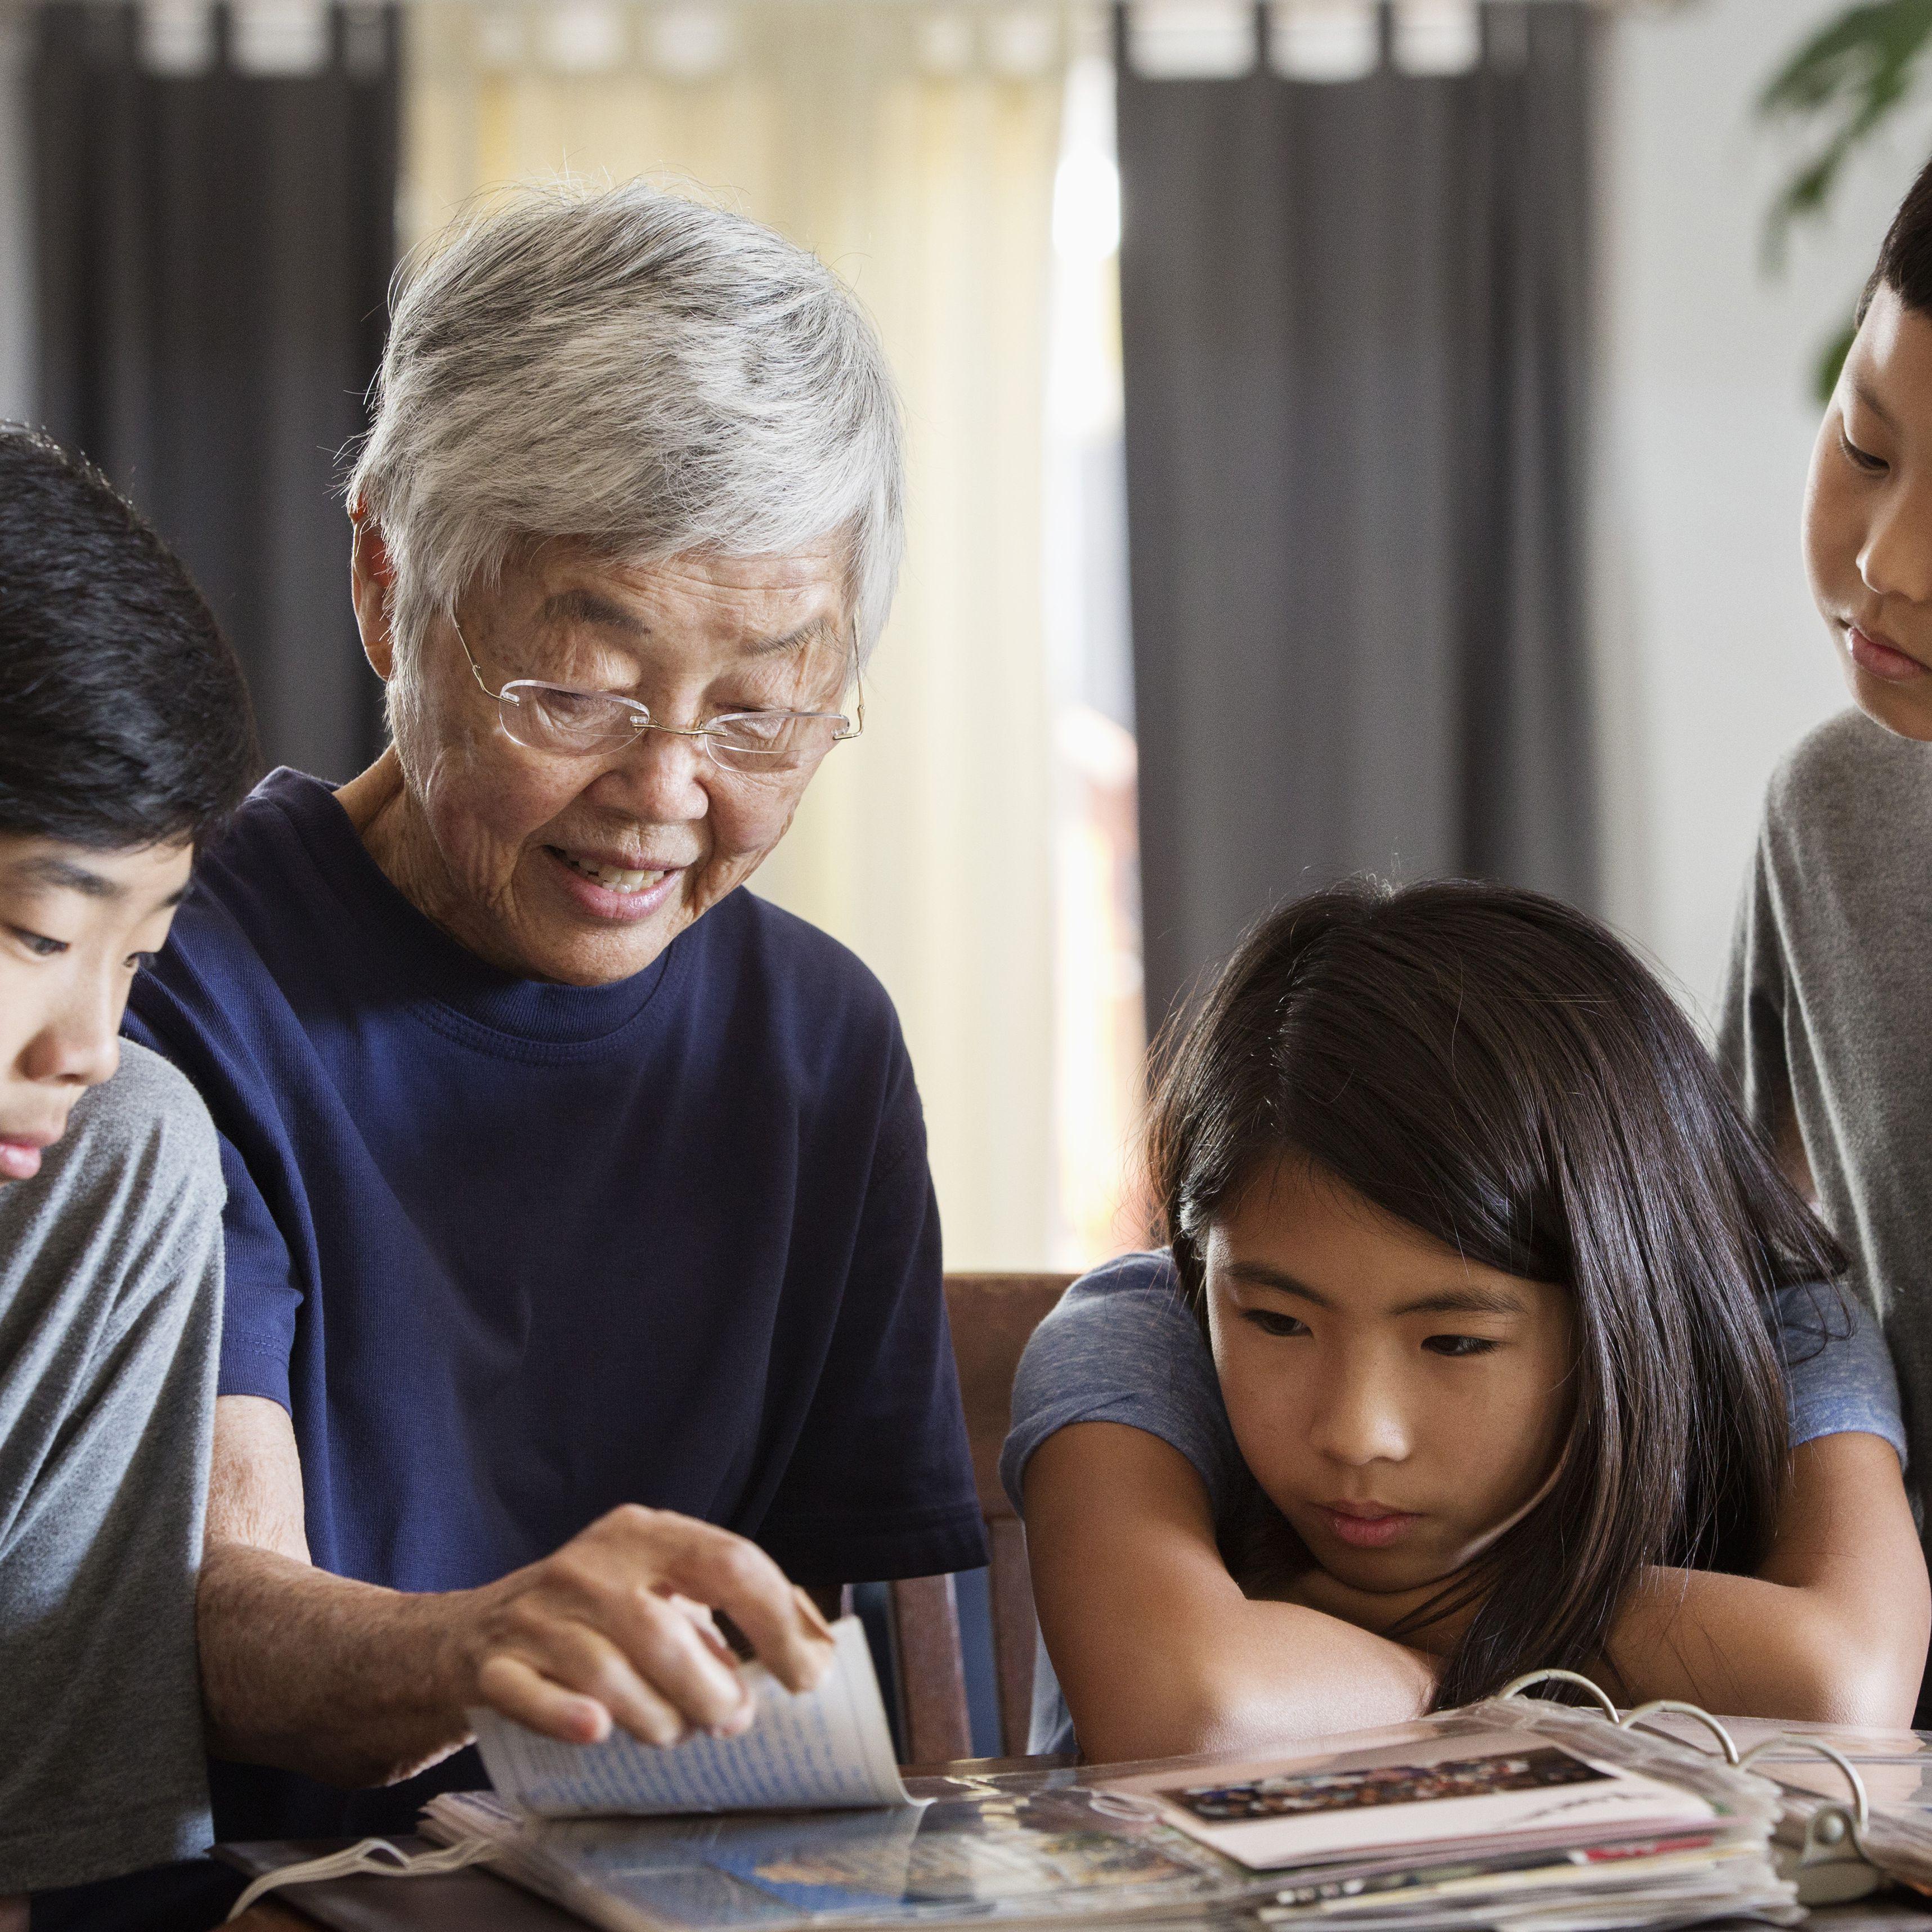 Books For Grandma For Christmas 2021 The 14 Best Keepsake Books For Grandparents To Give To Grandchildren Of 2021